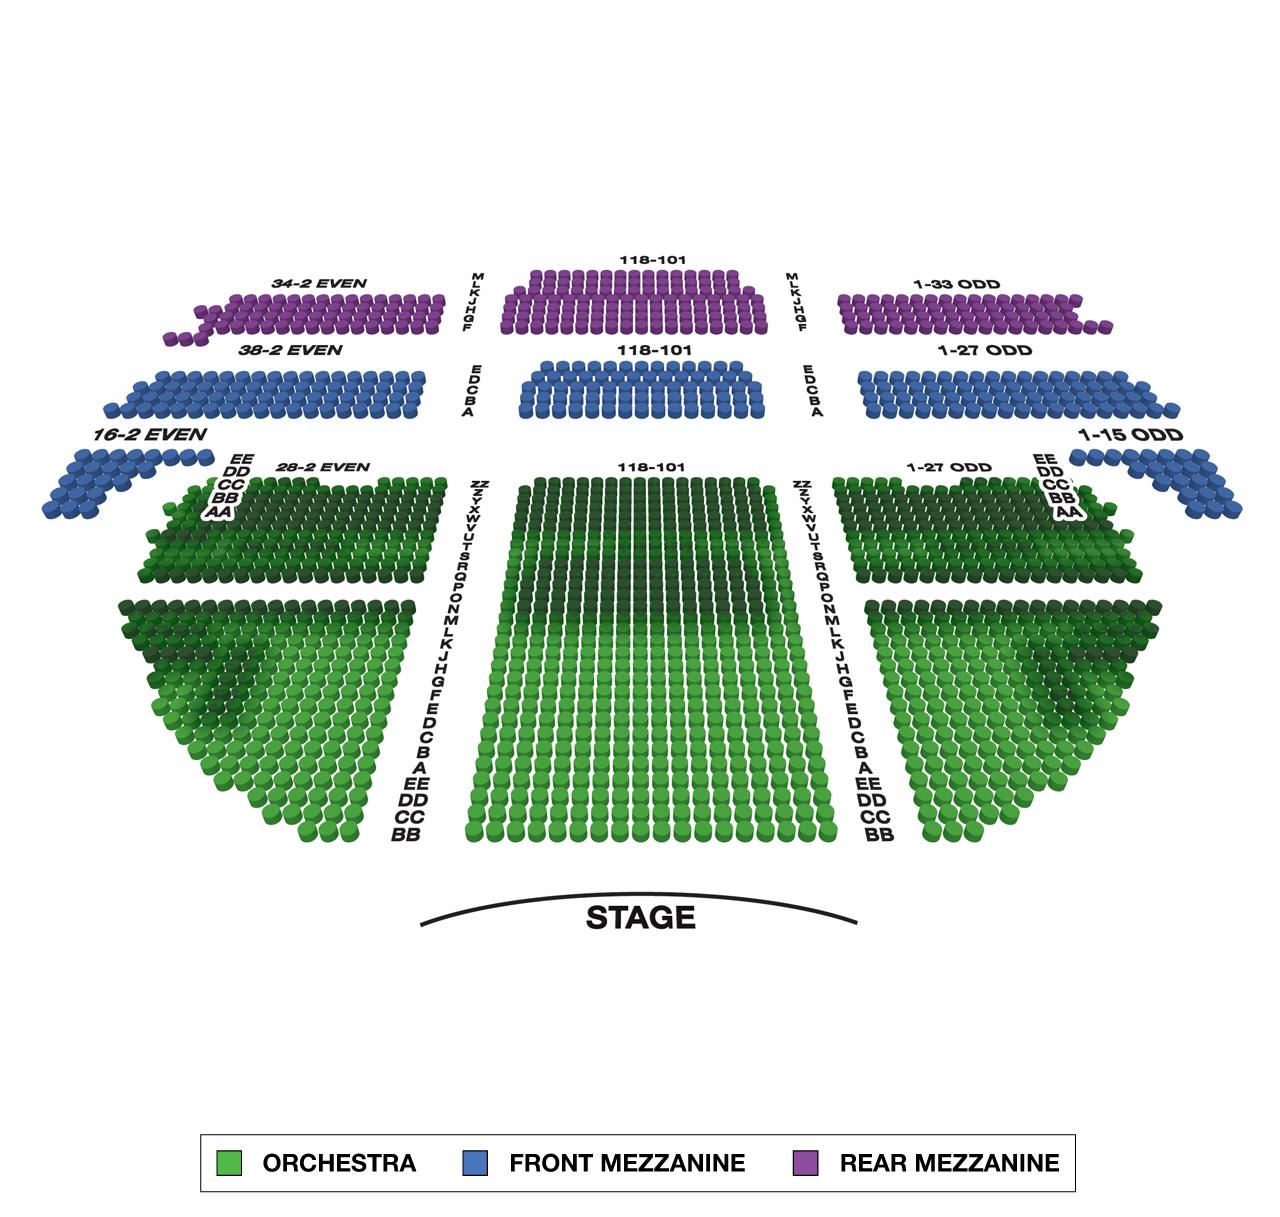 Gershwin theatre large broadway seating charts